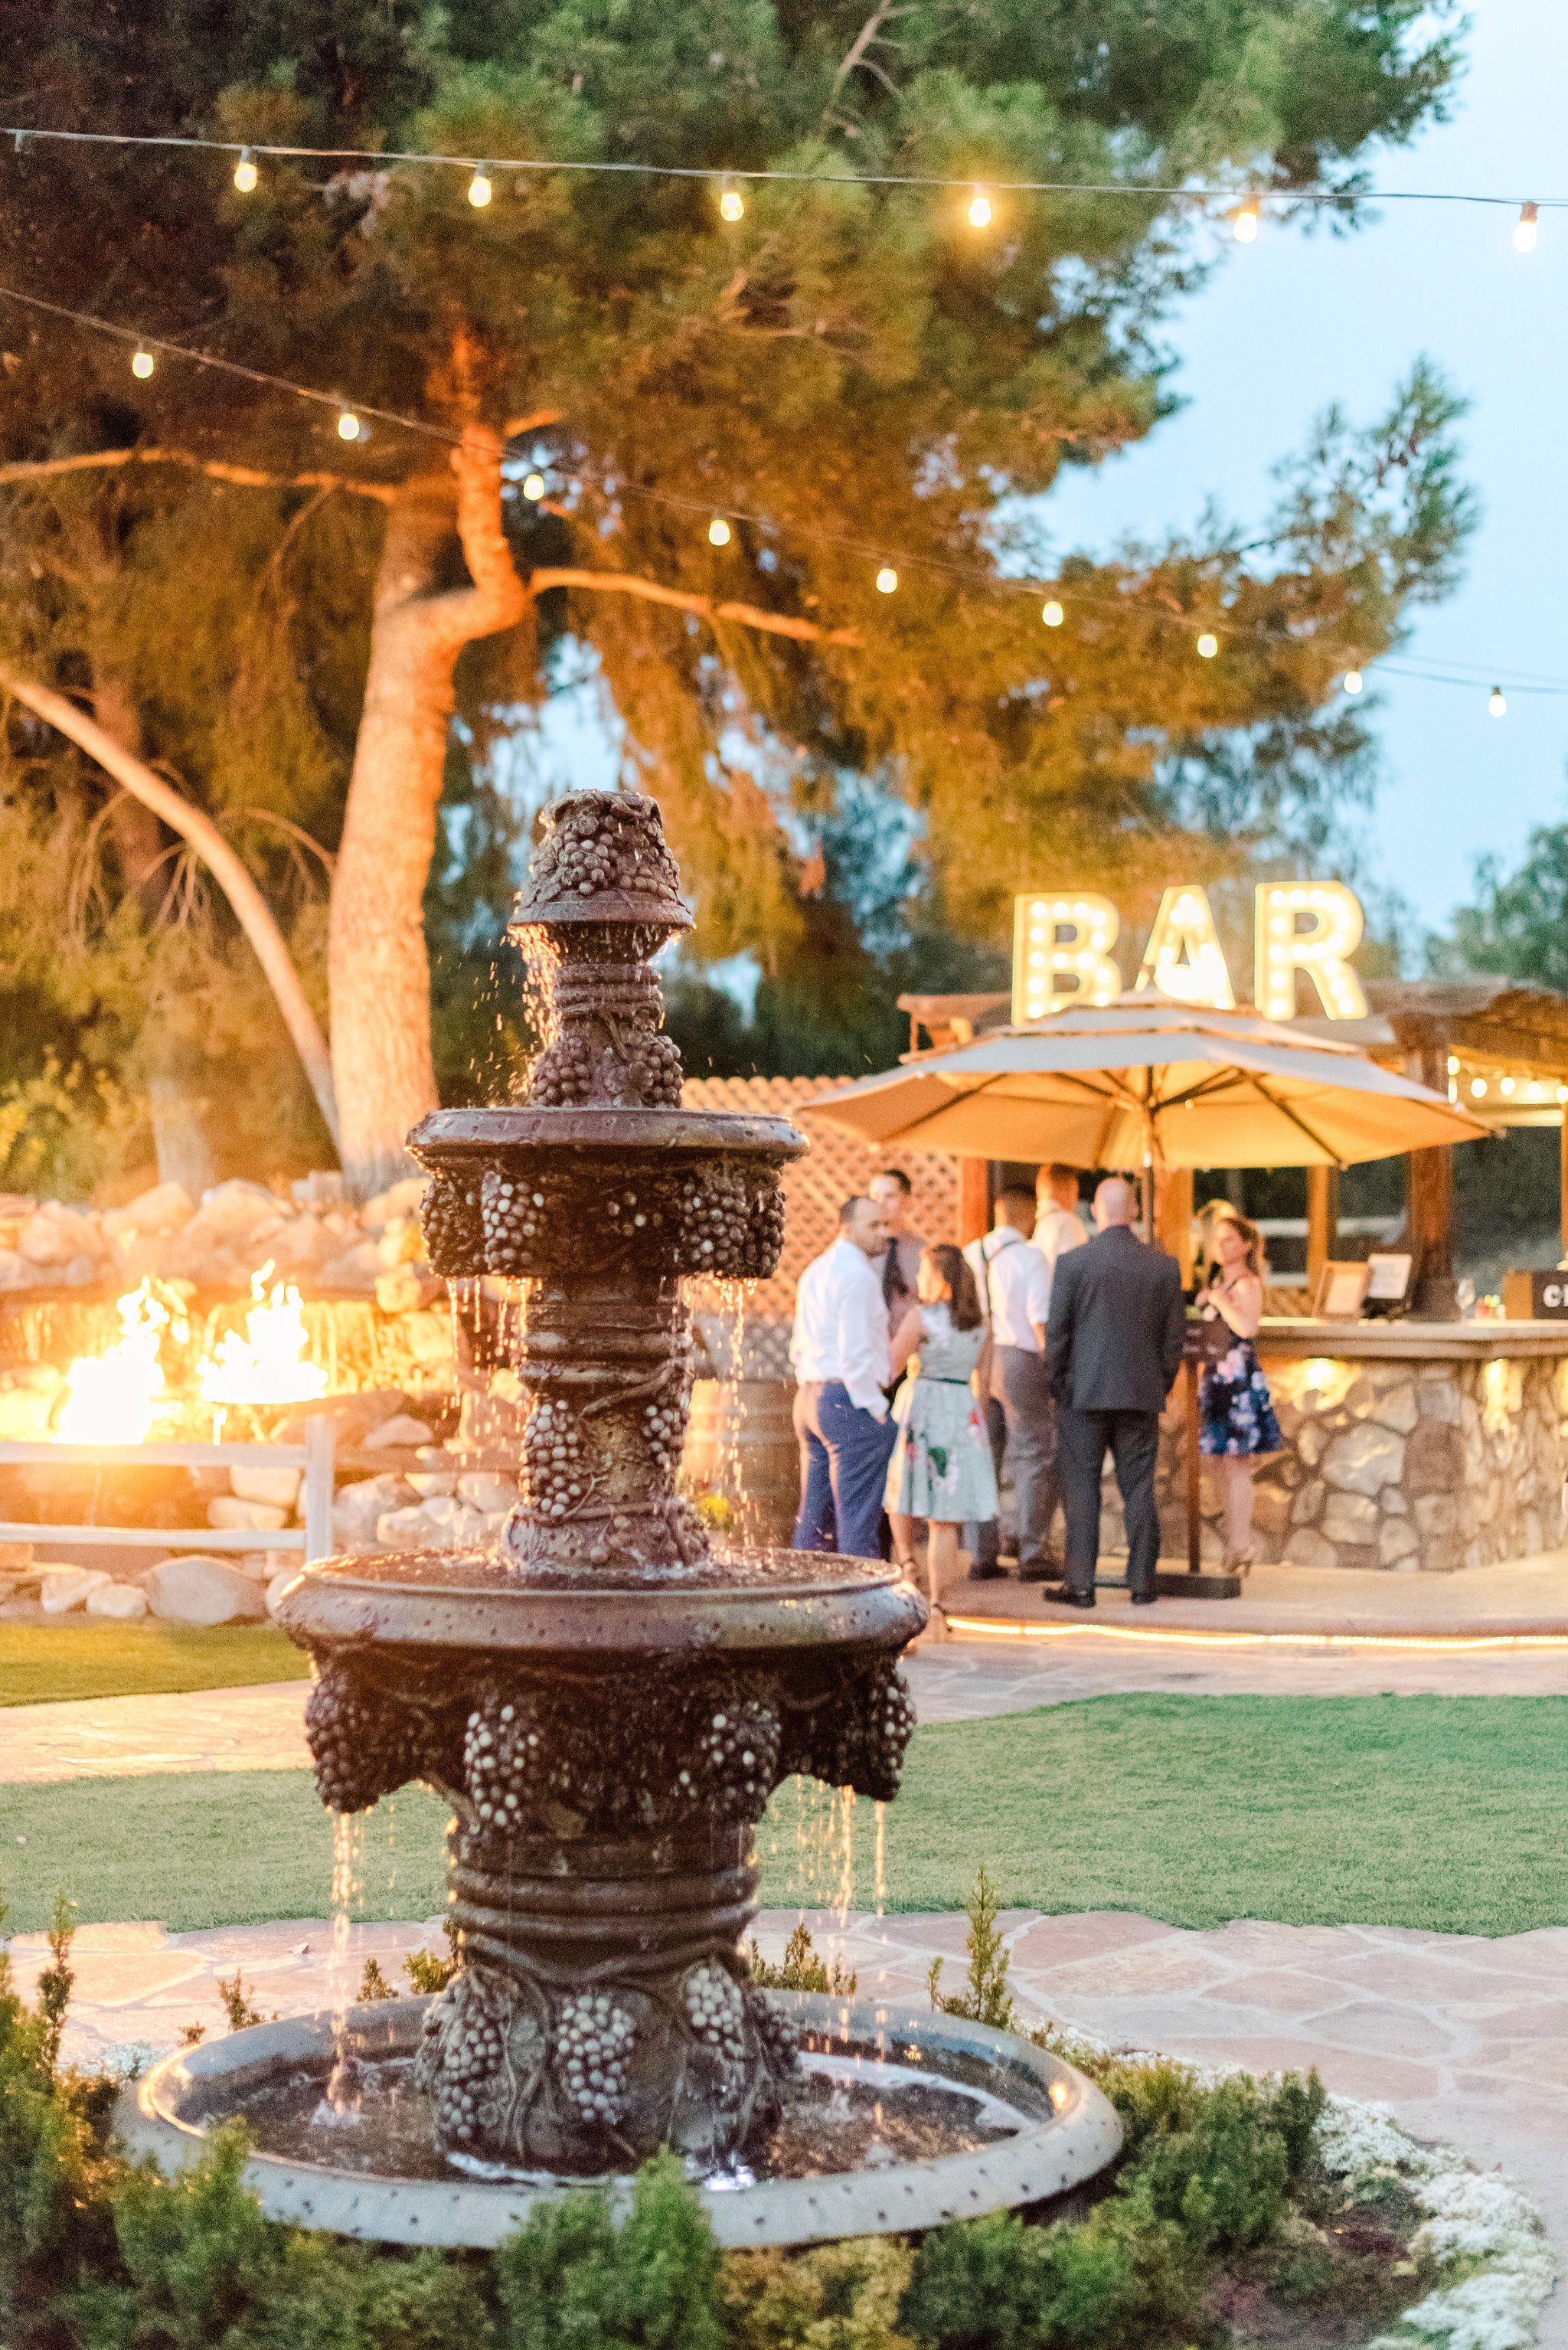 Lake Oak Meadows Bar Wine country wedding venues, Wine